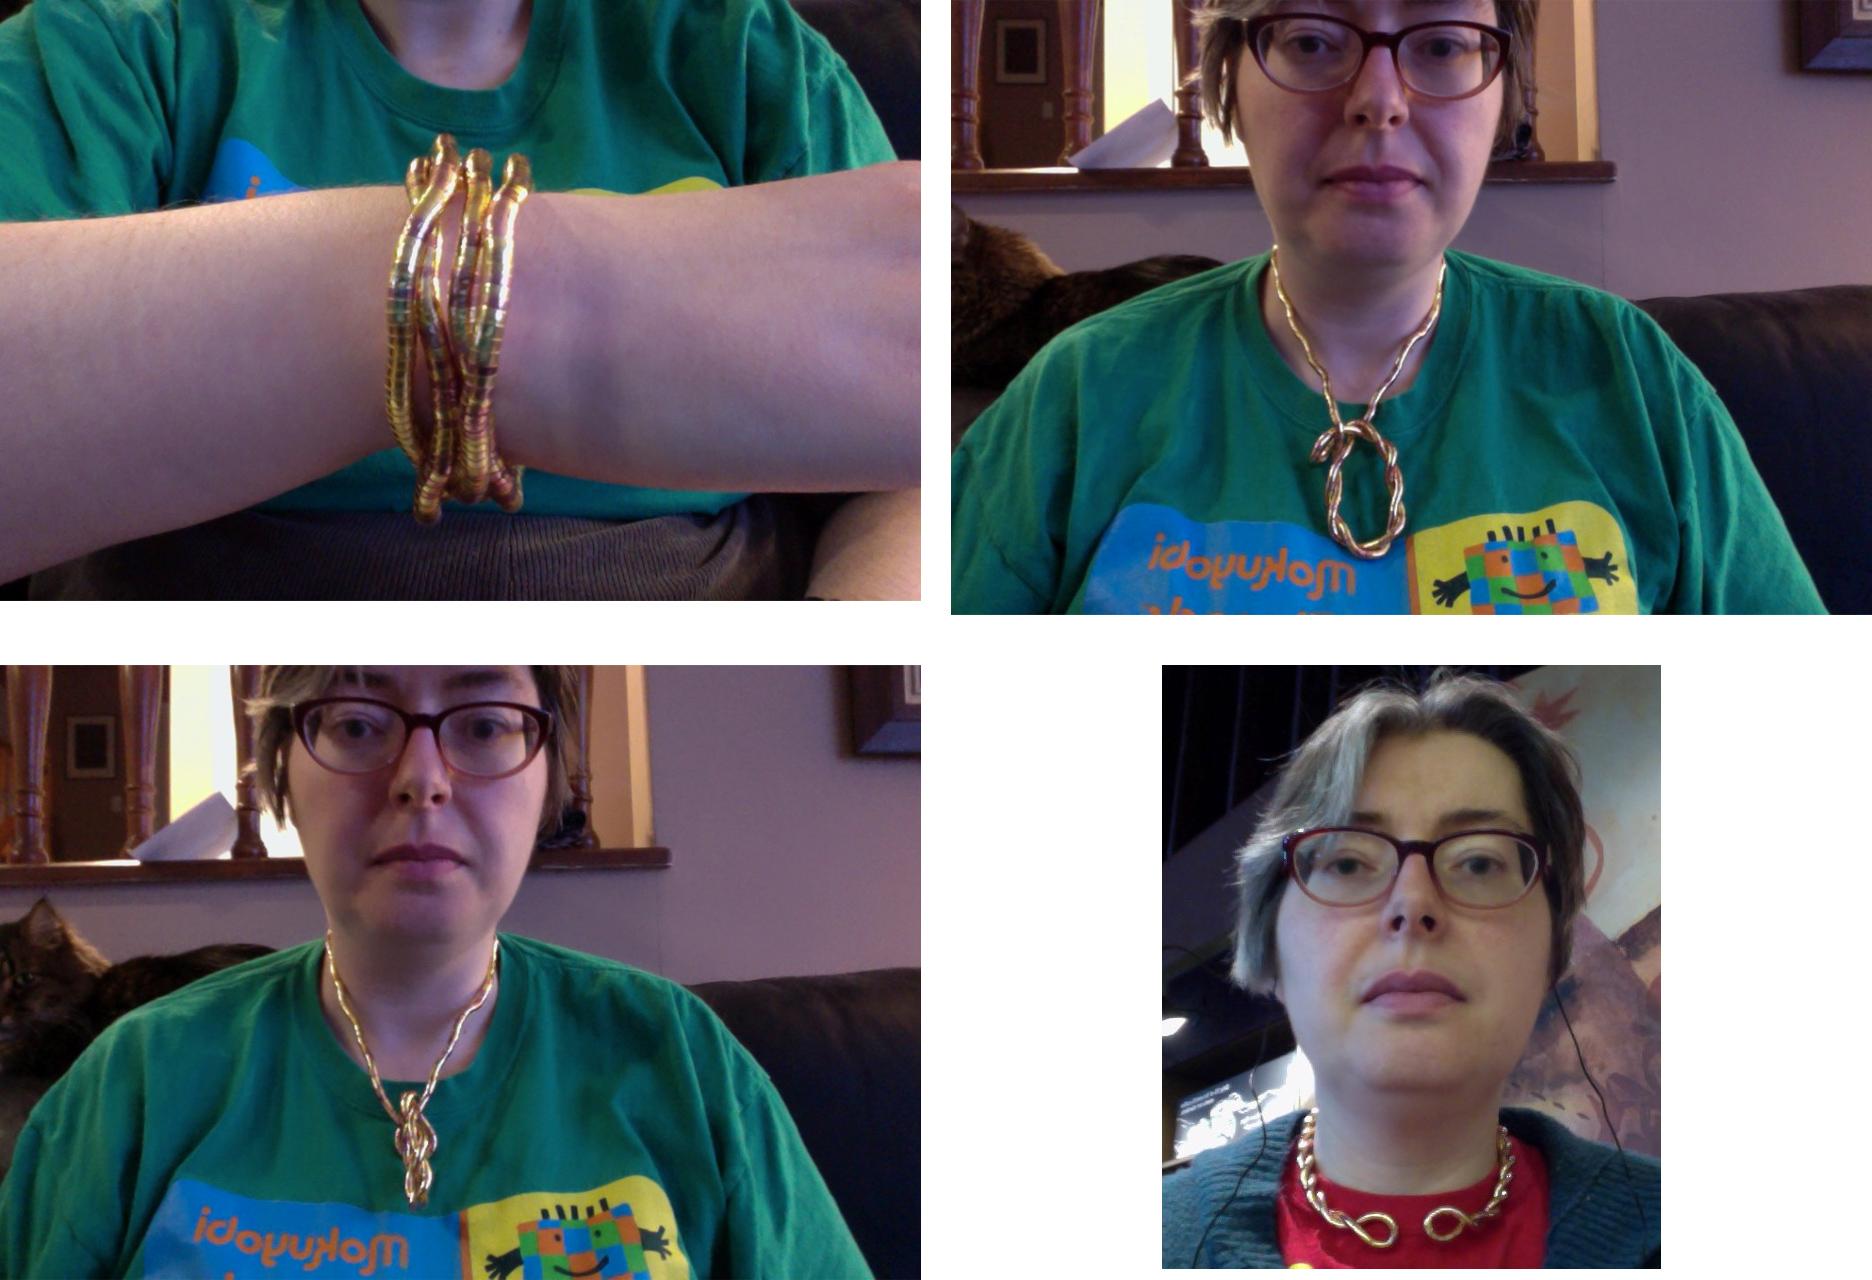 Trudy, with a snake twist worn 4 different ways